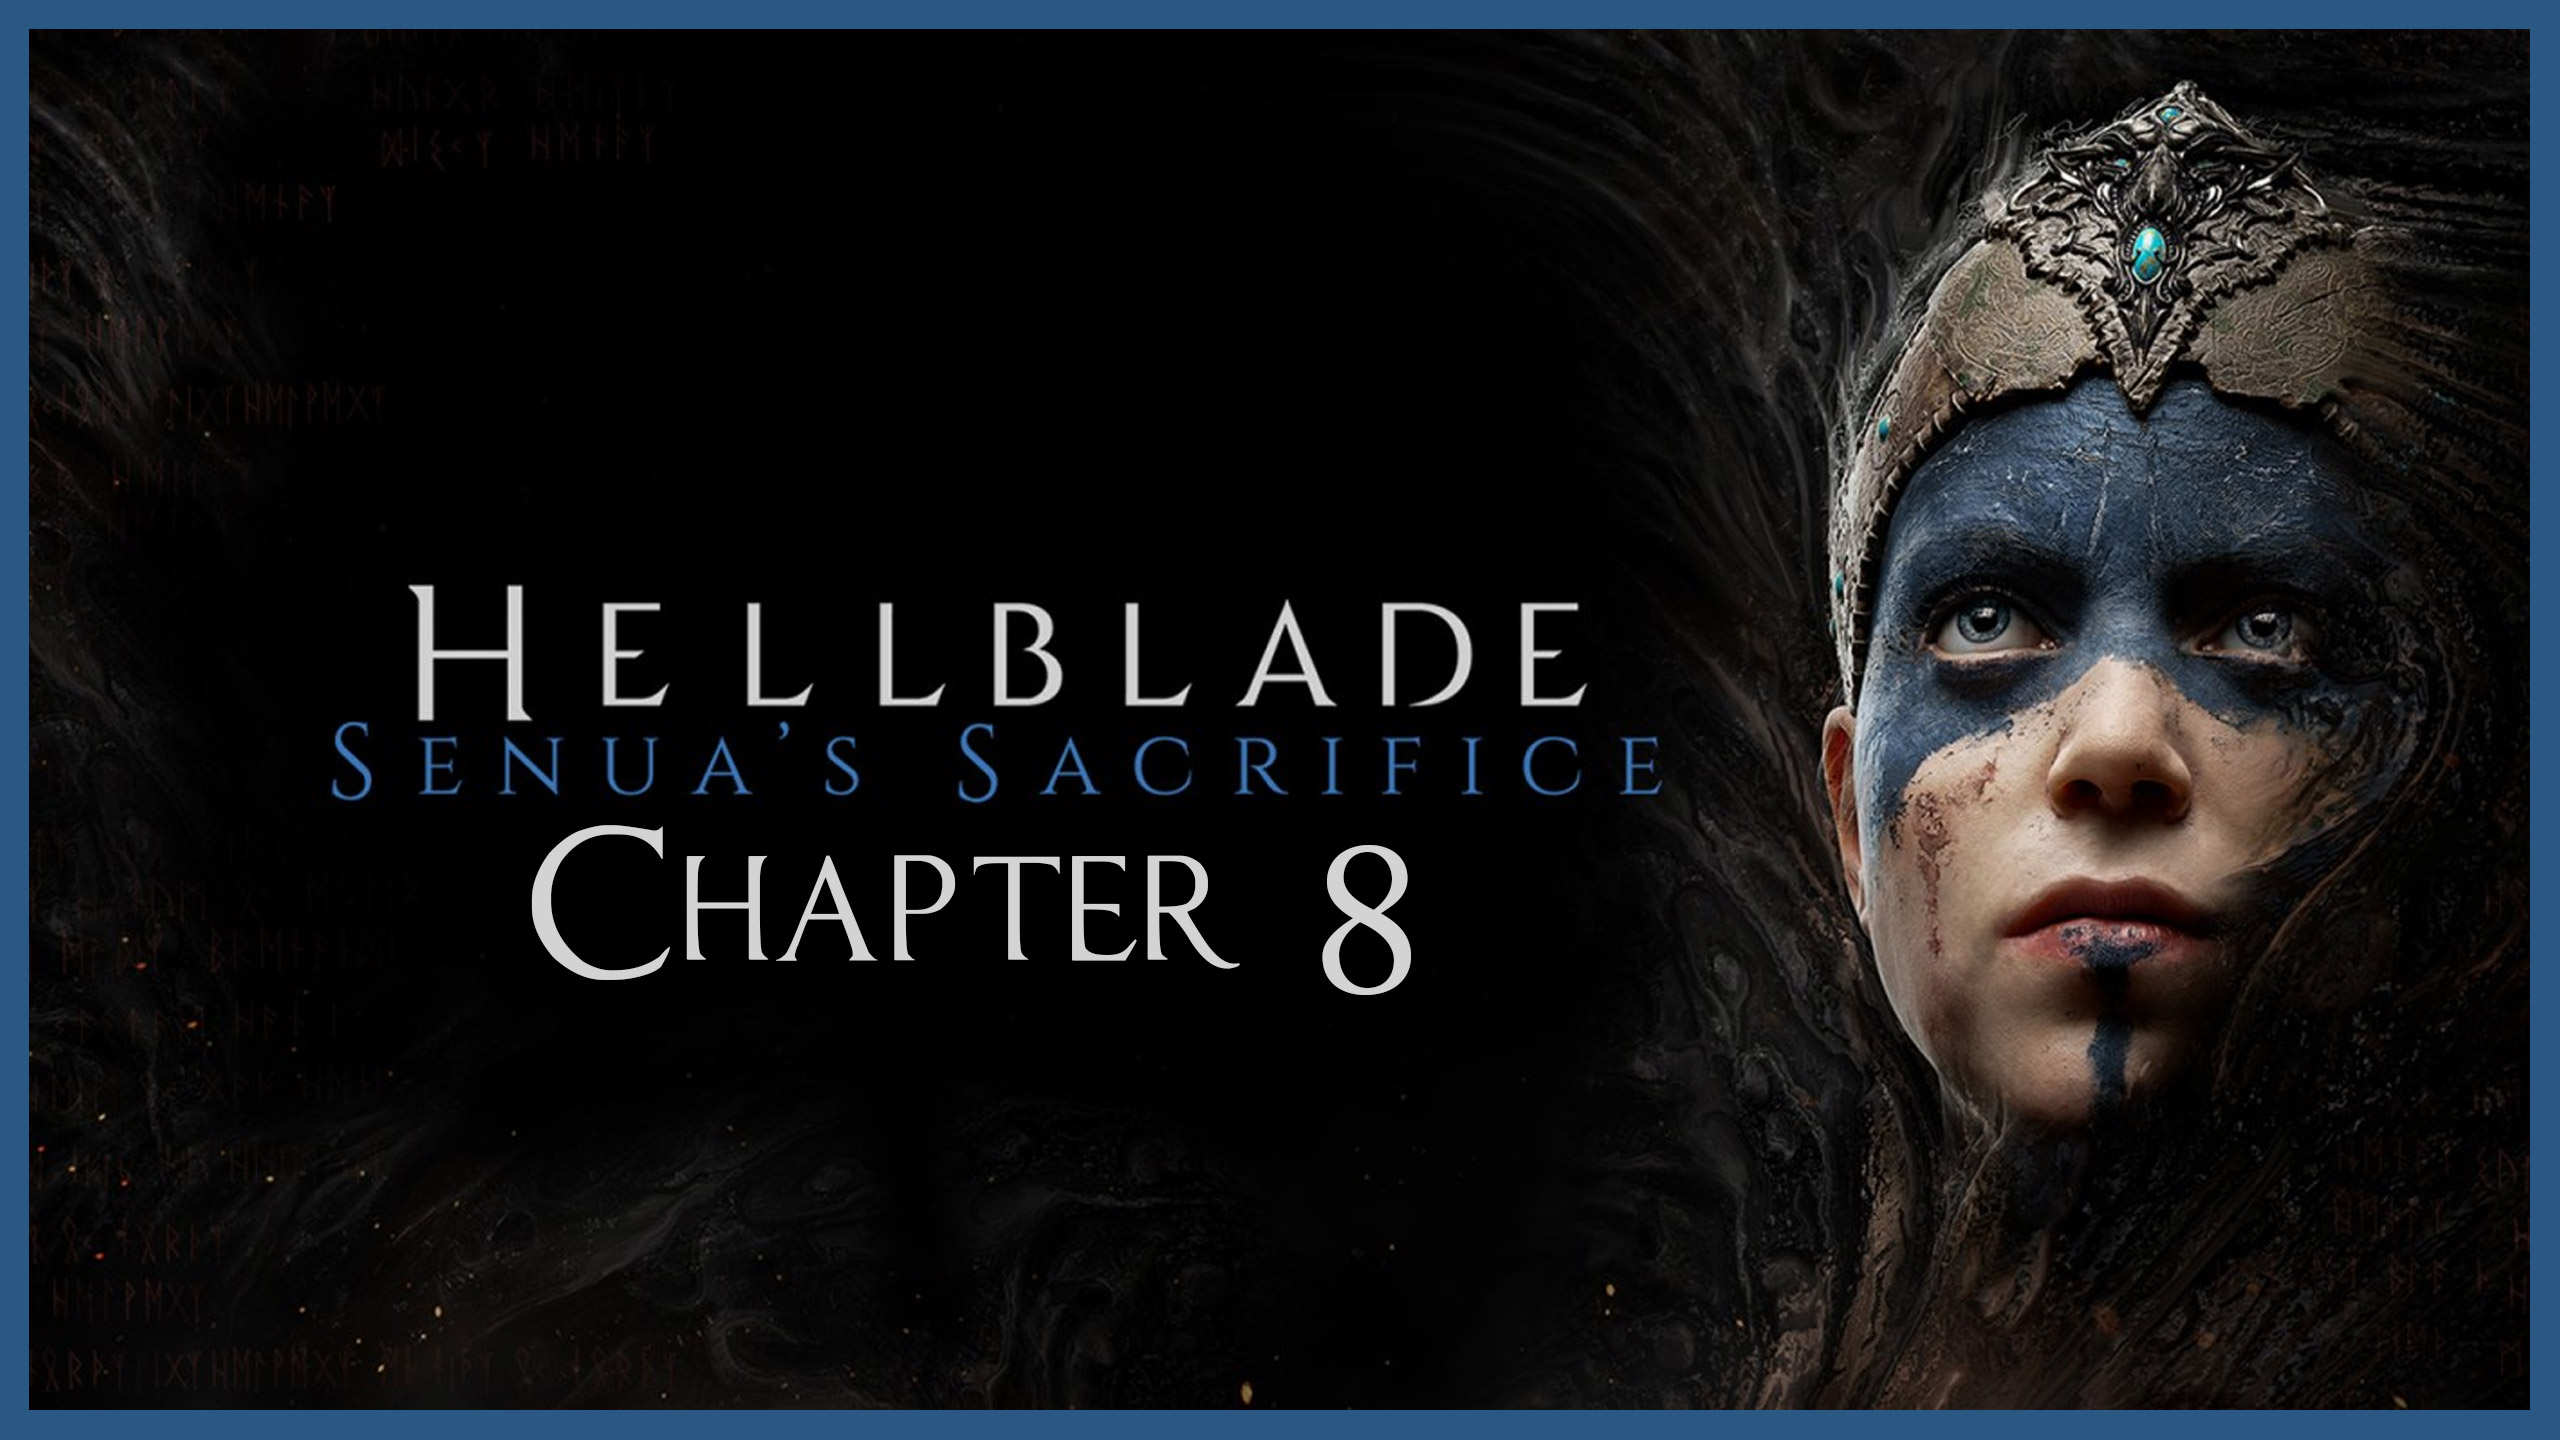 Hellblade Senua's Sacrifice. Все камни знаний. Глава 8